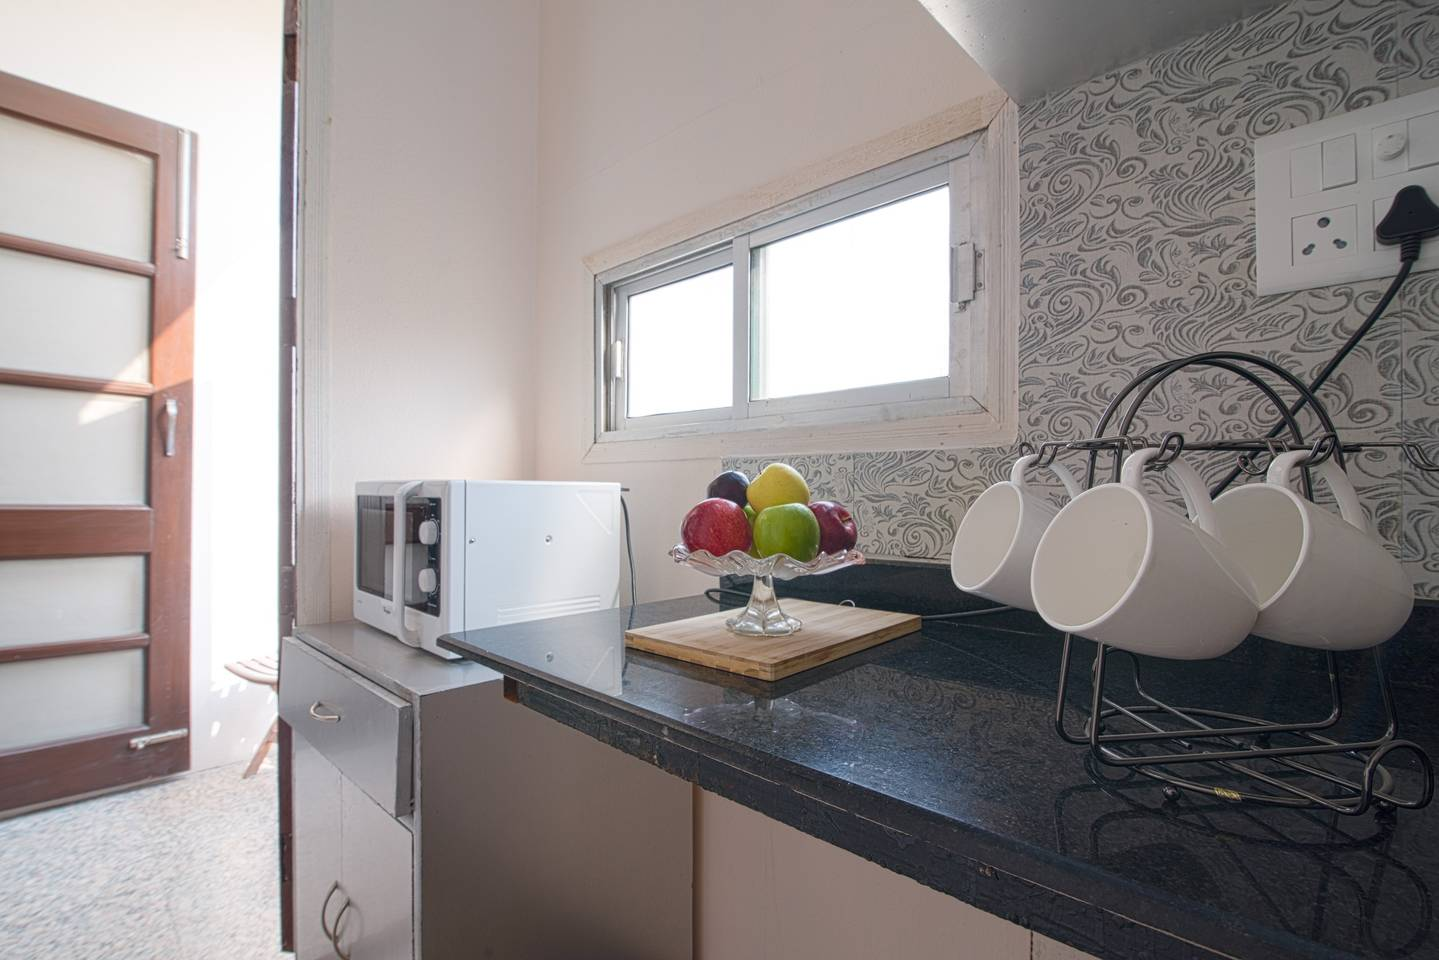 Studio Apartment with kitchen near Galleria photo 18445978